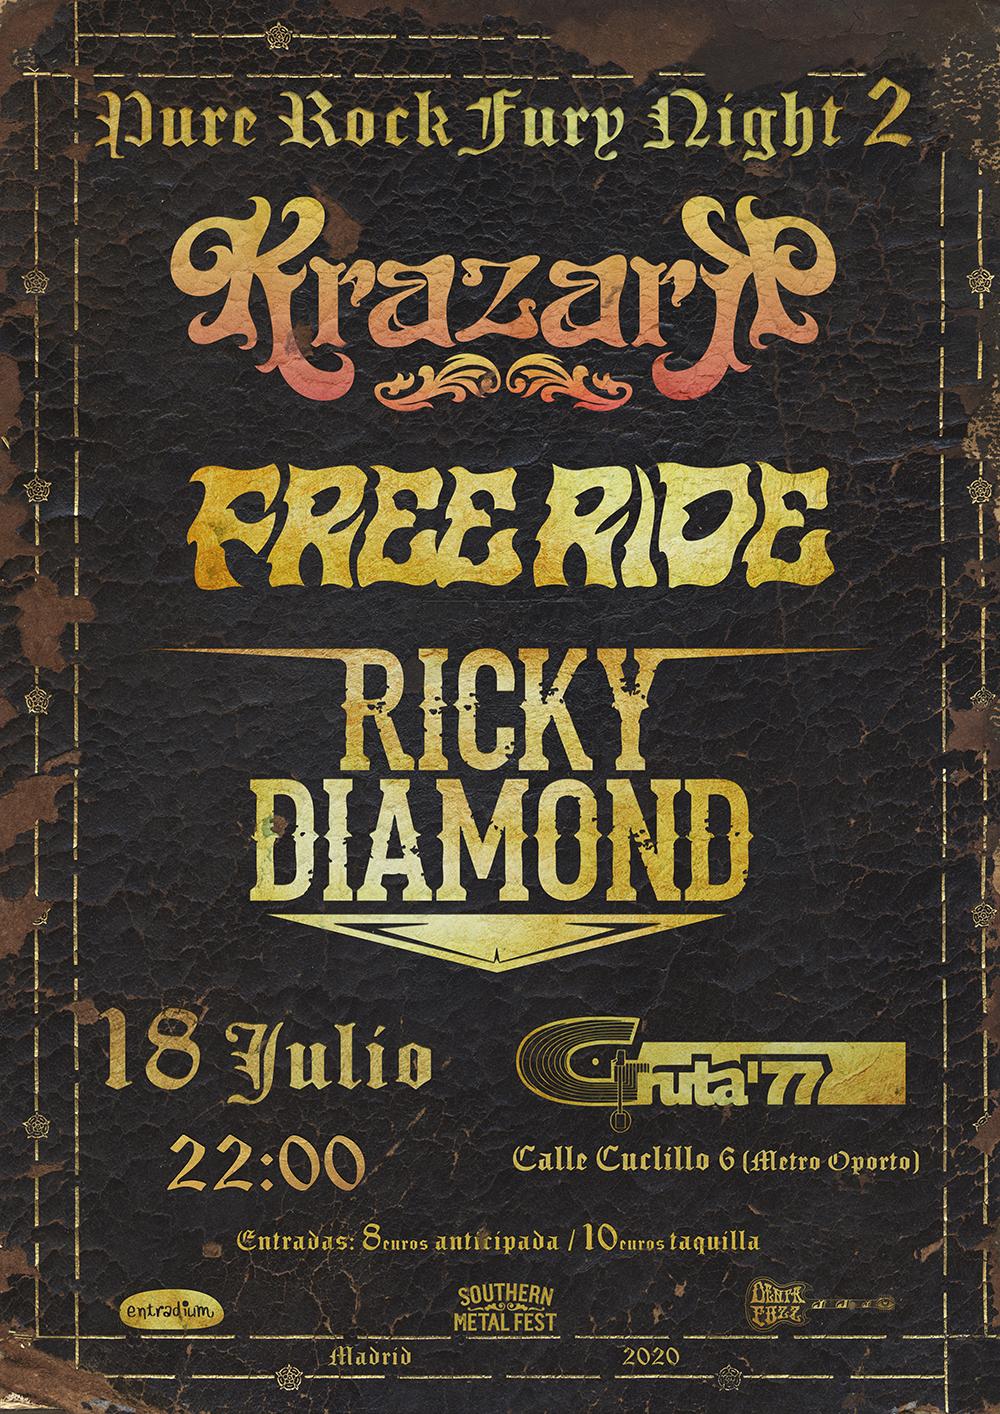 Pure Rock Fury Night 2: 18 de julio en Madrid (Sala Gruta 77)